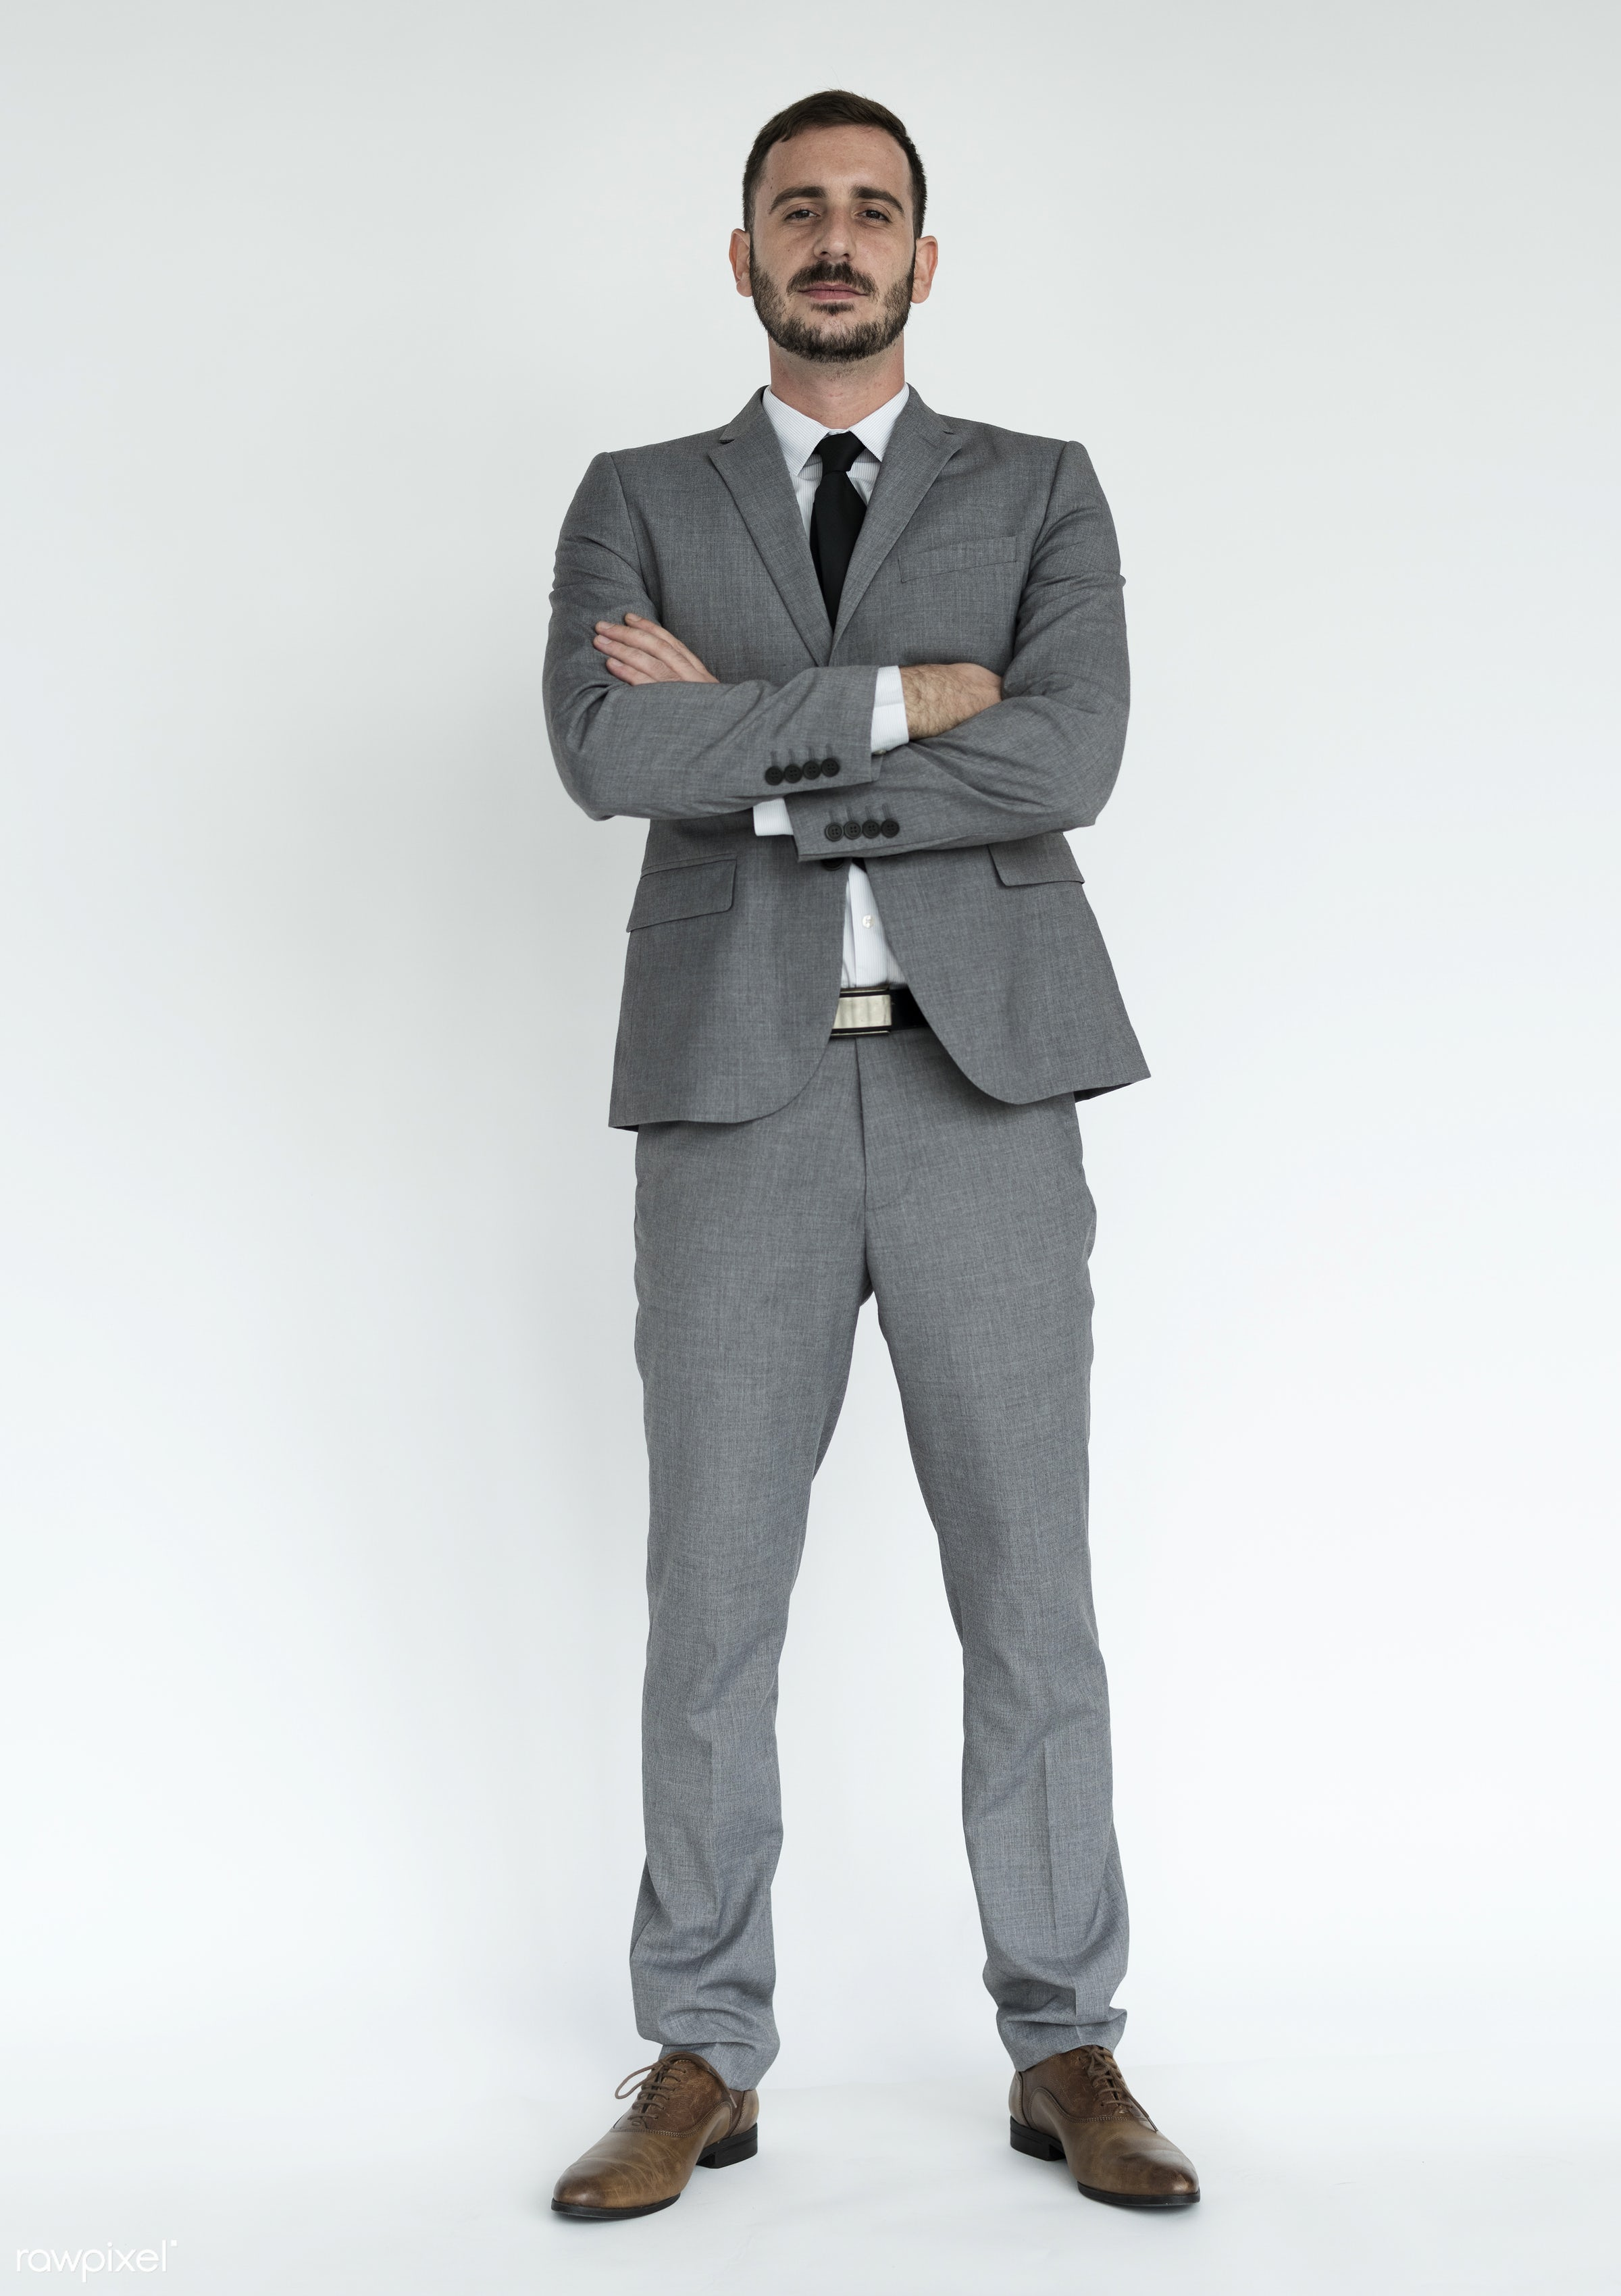 Businessman Adult Portrait Occupation Concept - studio, person, one, people, business, modern, businessman, style,...